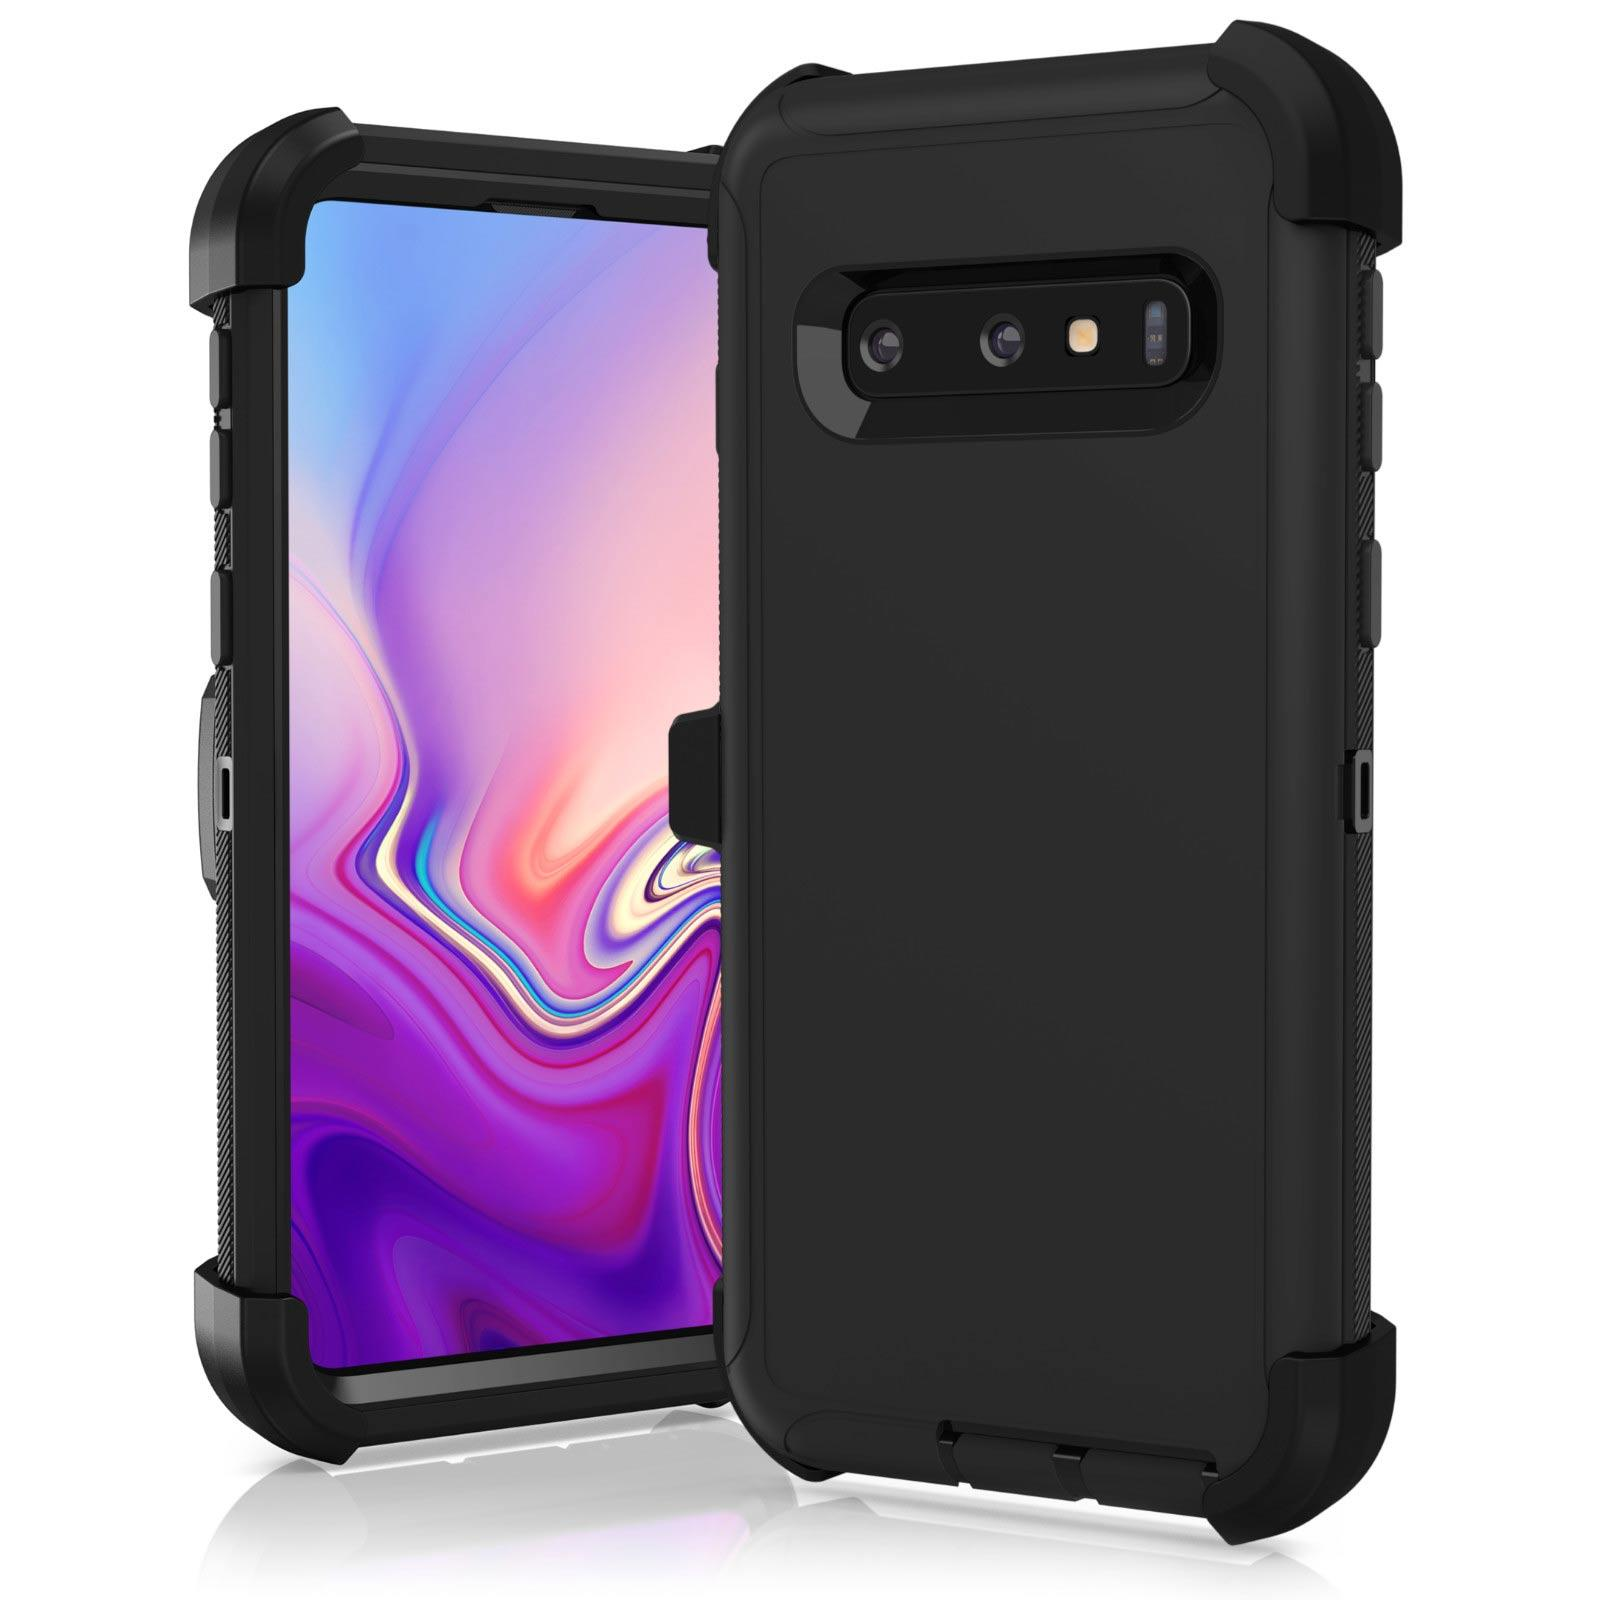 wholesale dealer a9c1d 36d0b New For Samsung Galaxy S8 S9 S10 Plus Note 8 9 Case Shockproof Hybrid (fits  Clip)